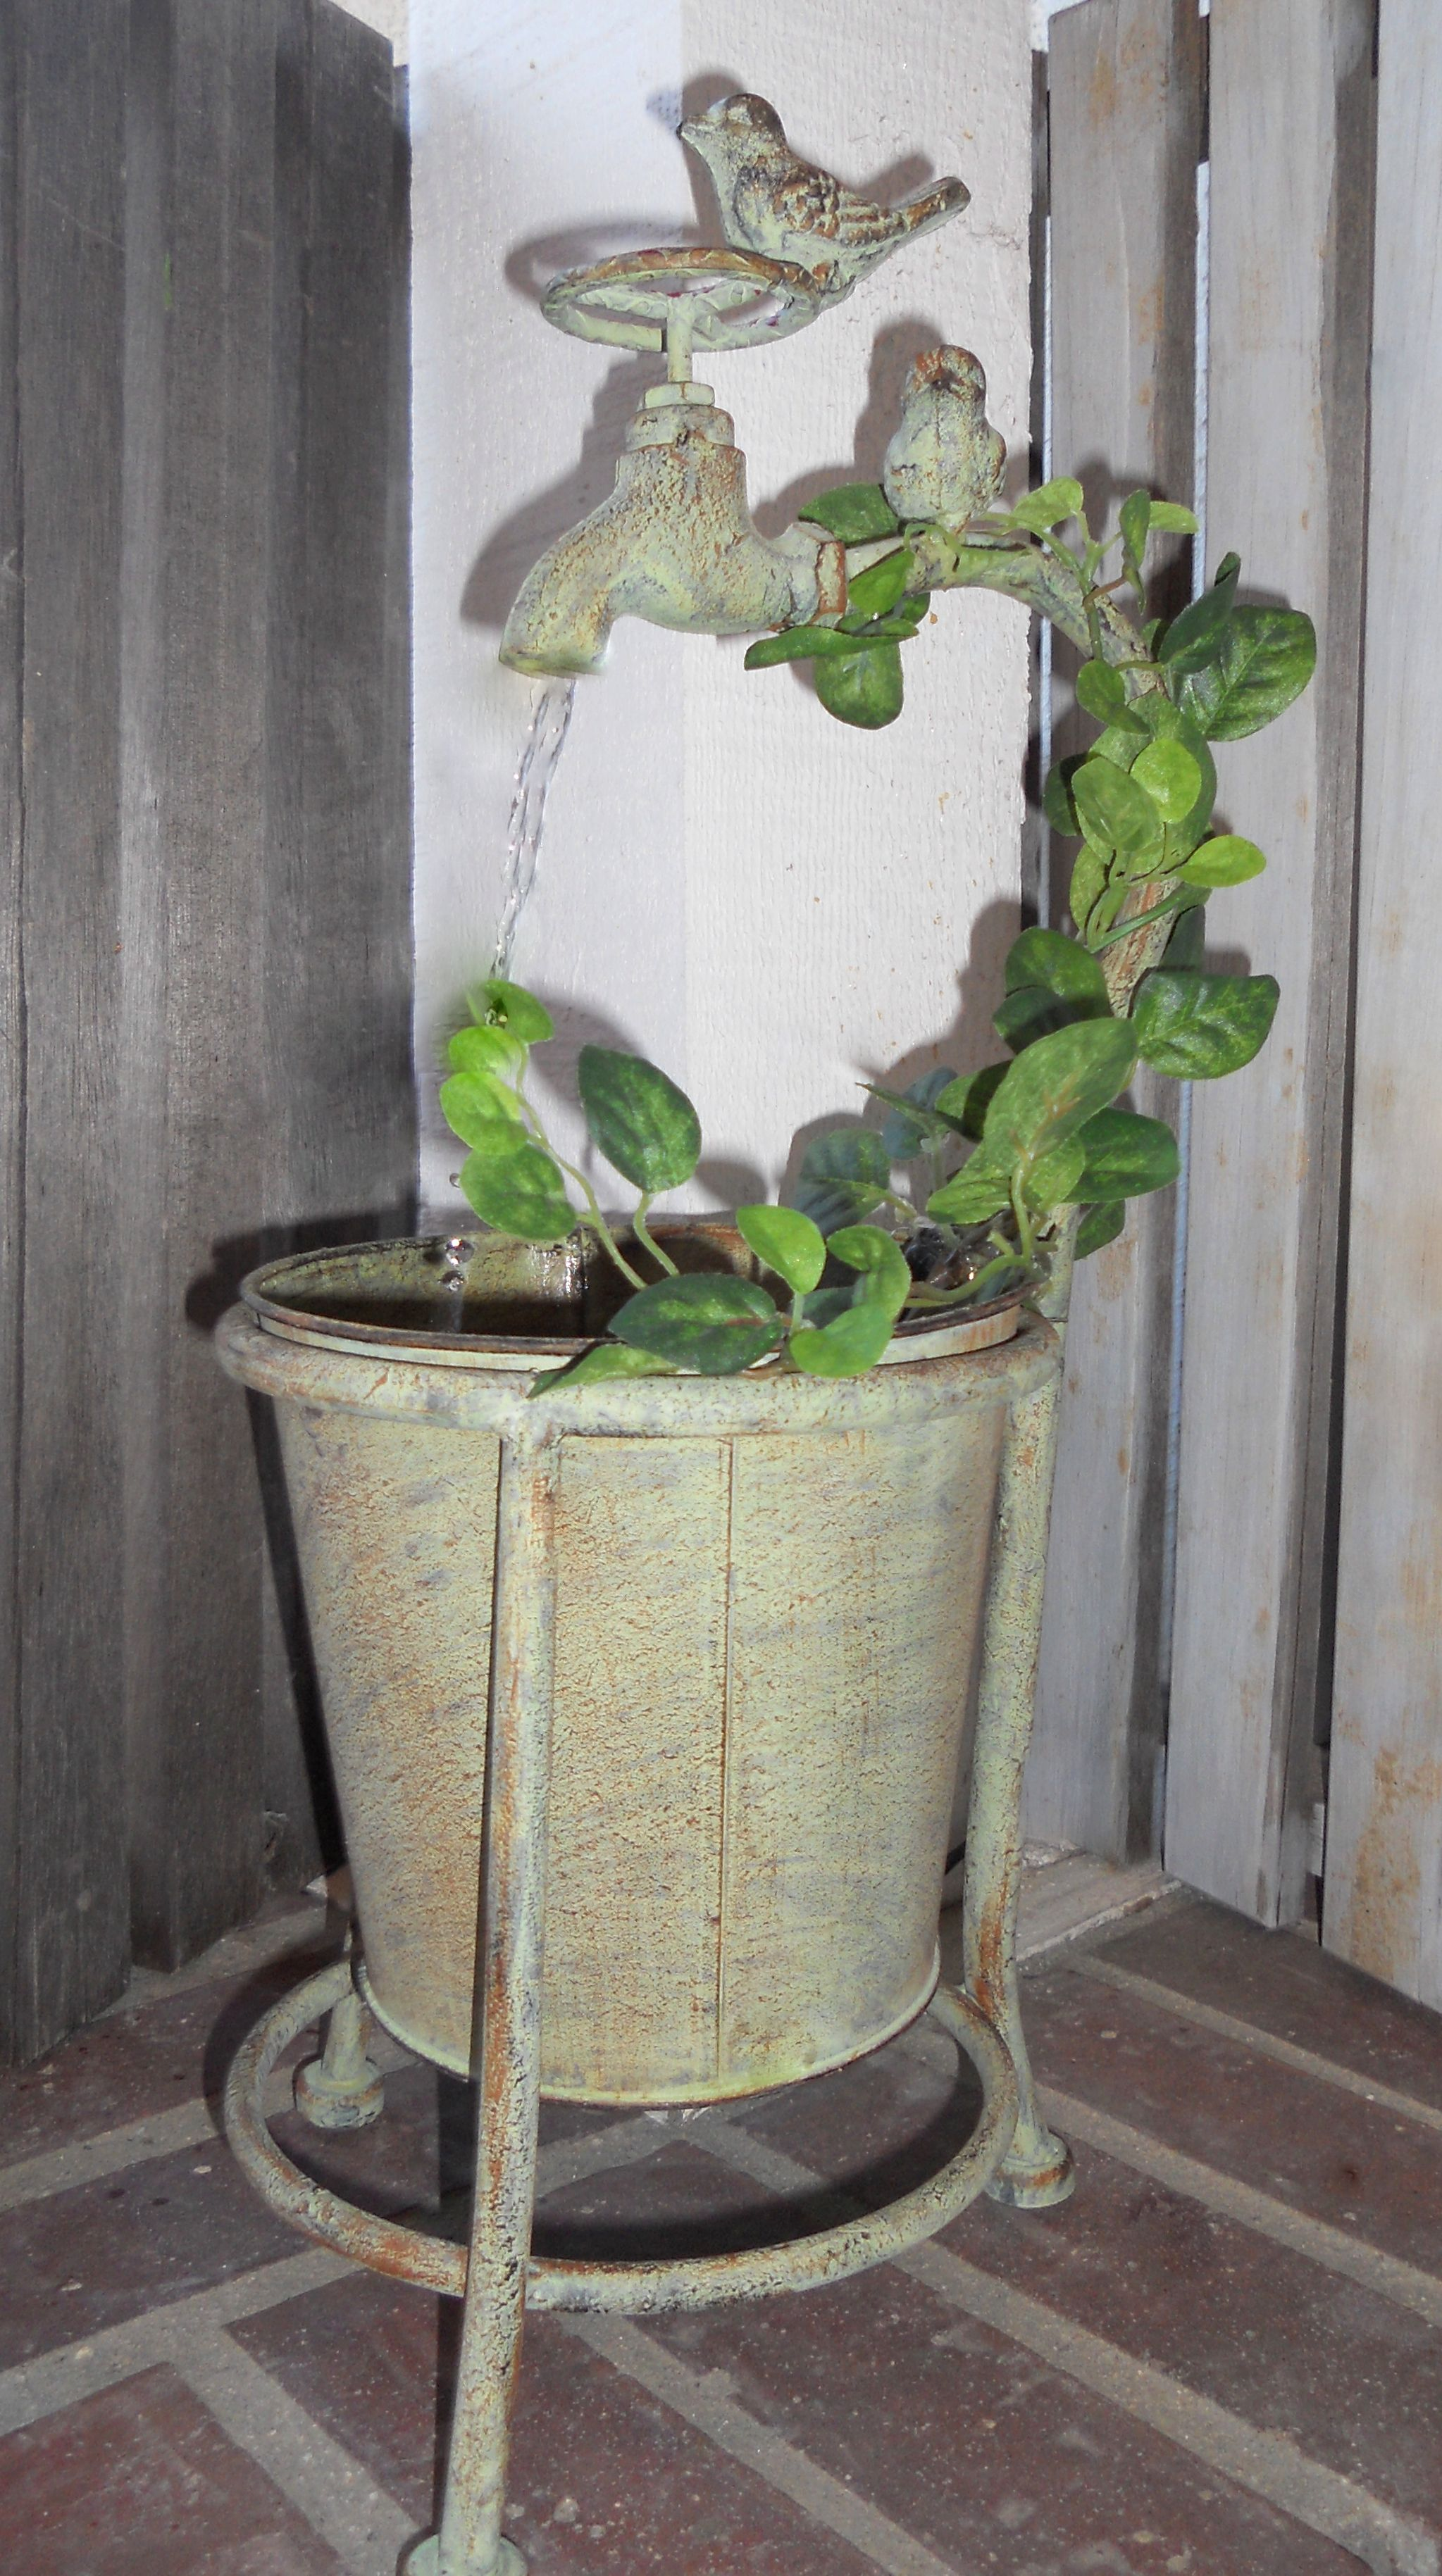 Bird\'s Garden Faucet Fountain - Decorative Tabletop Water Feature ...